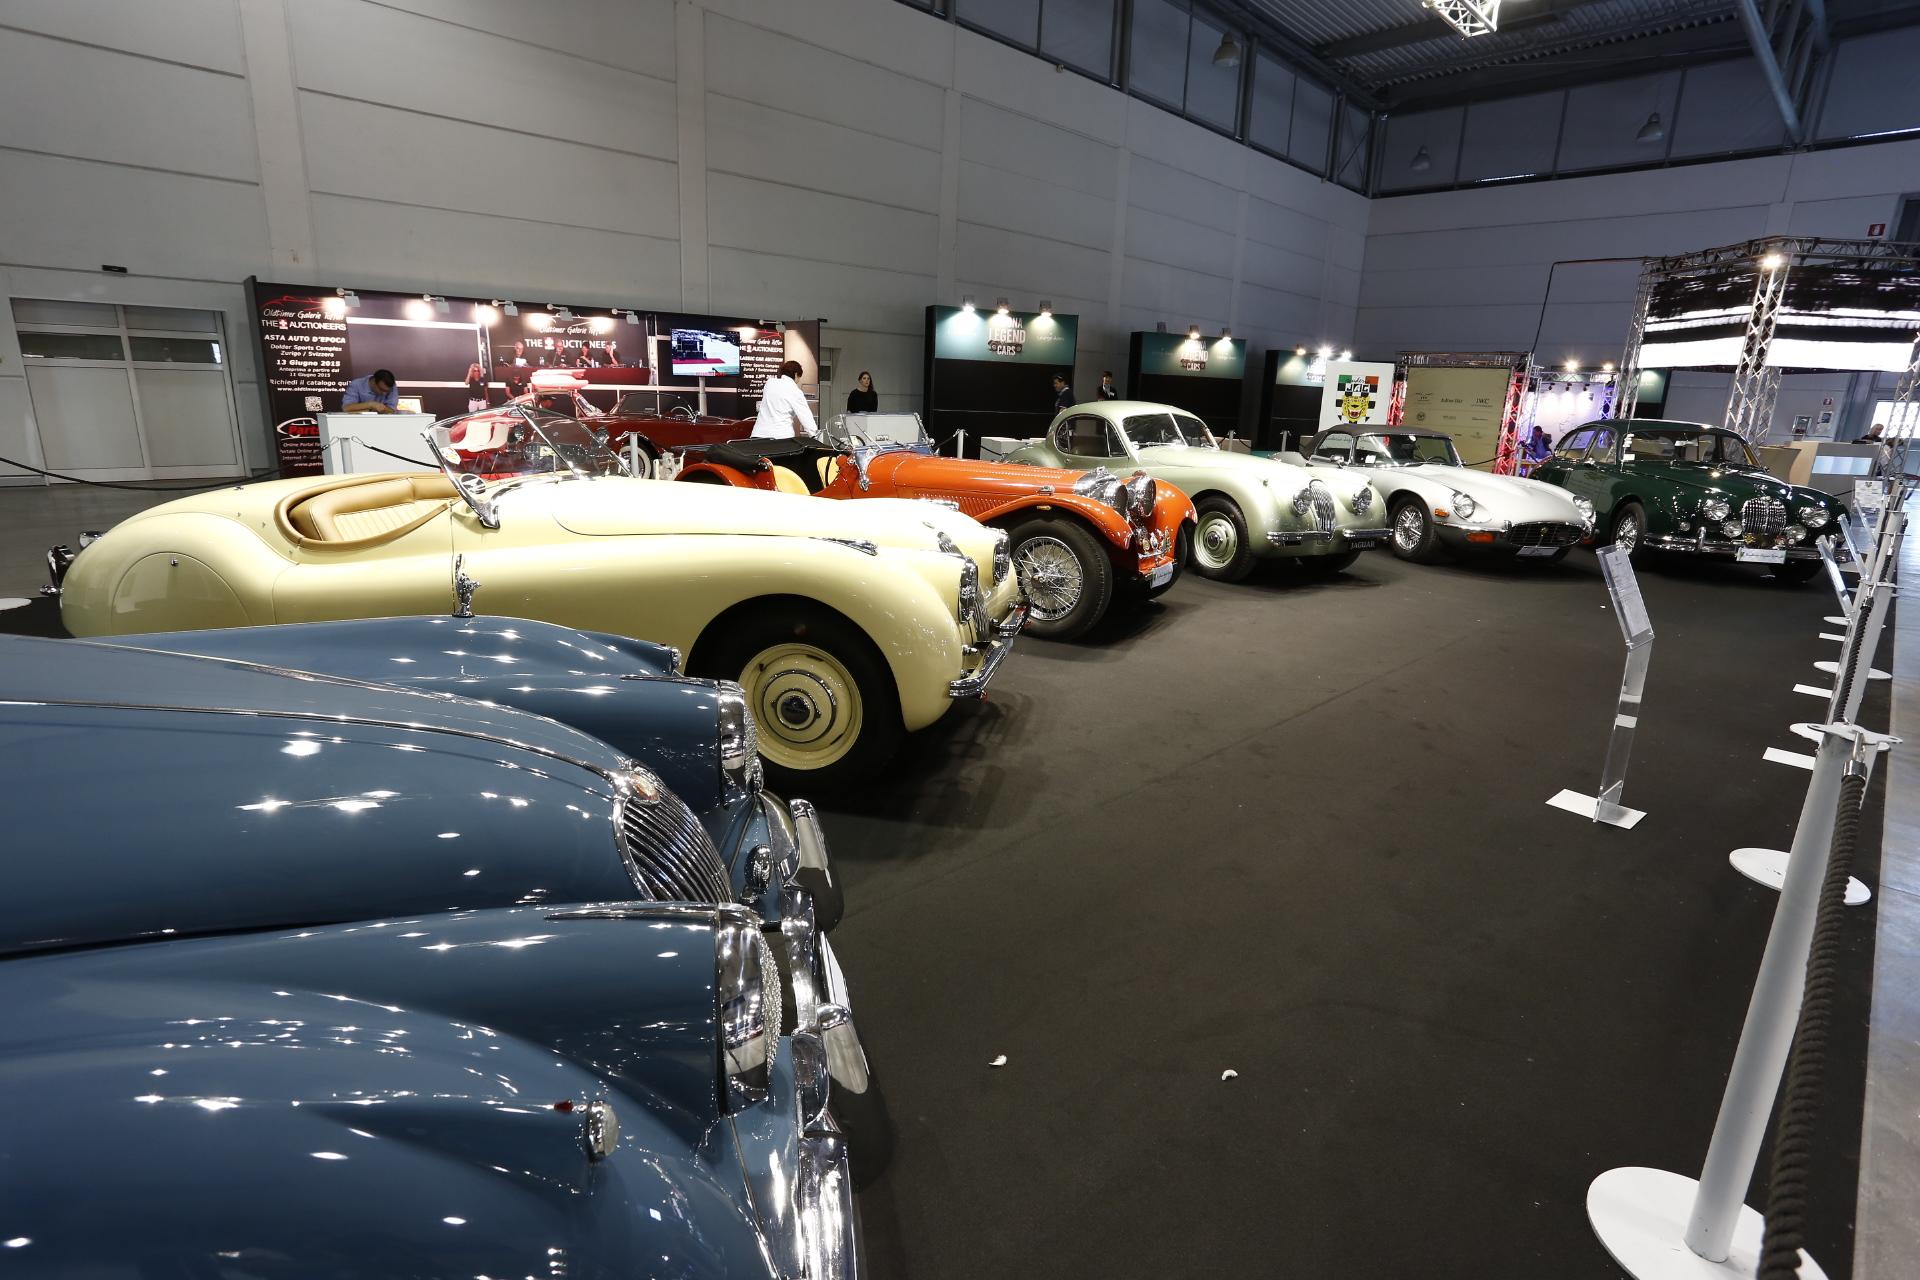 Verona Legend Cars: il bilancio